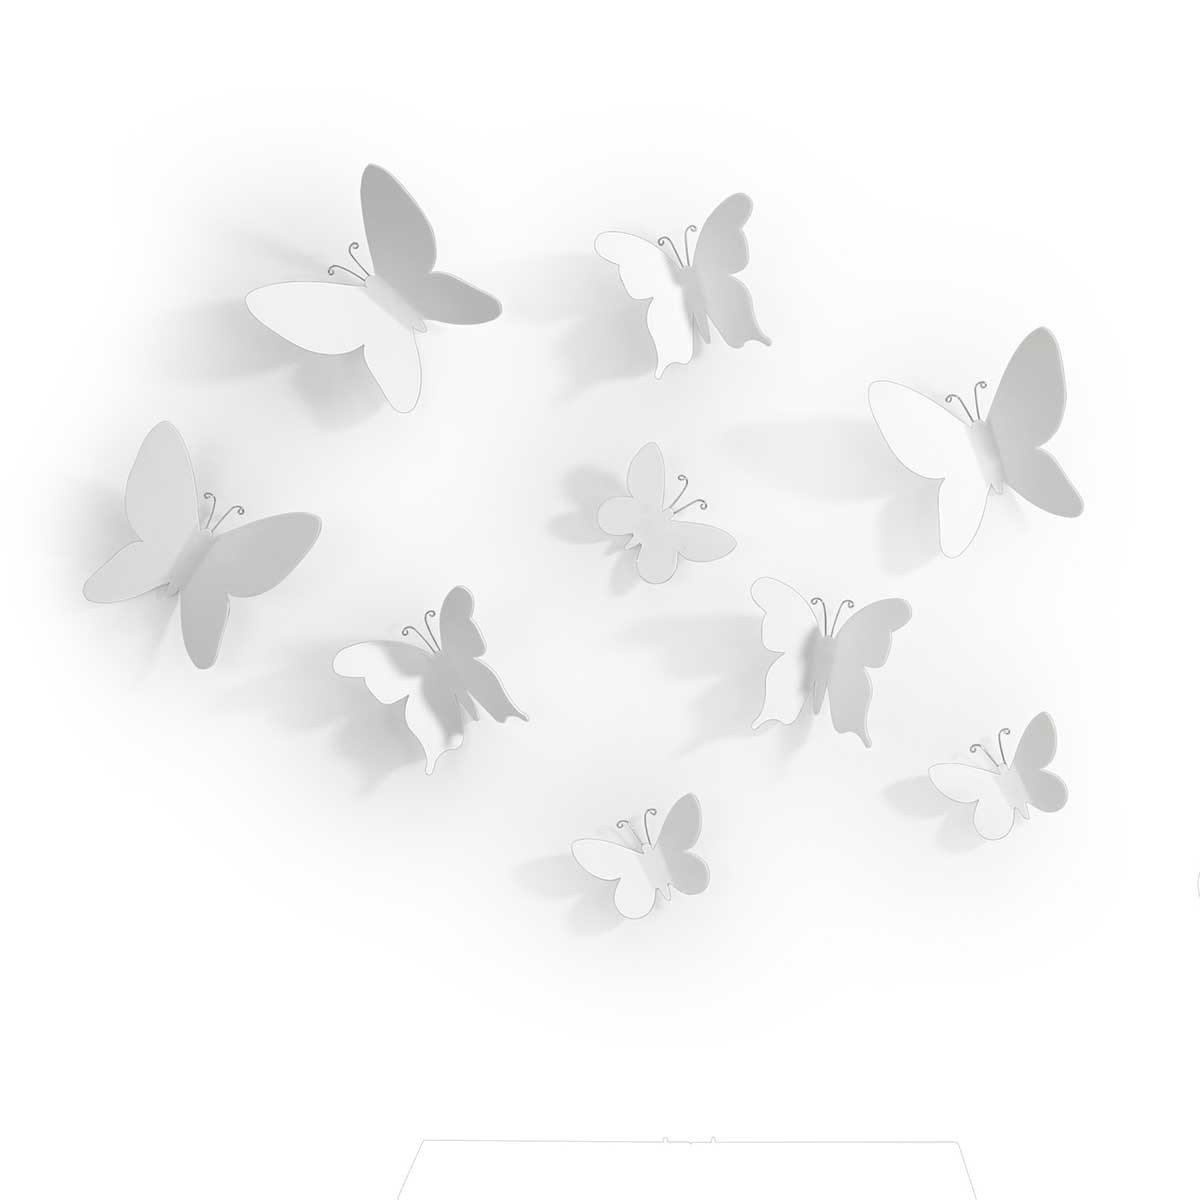 Dekorationssommerfugle til væggen